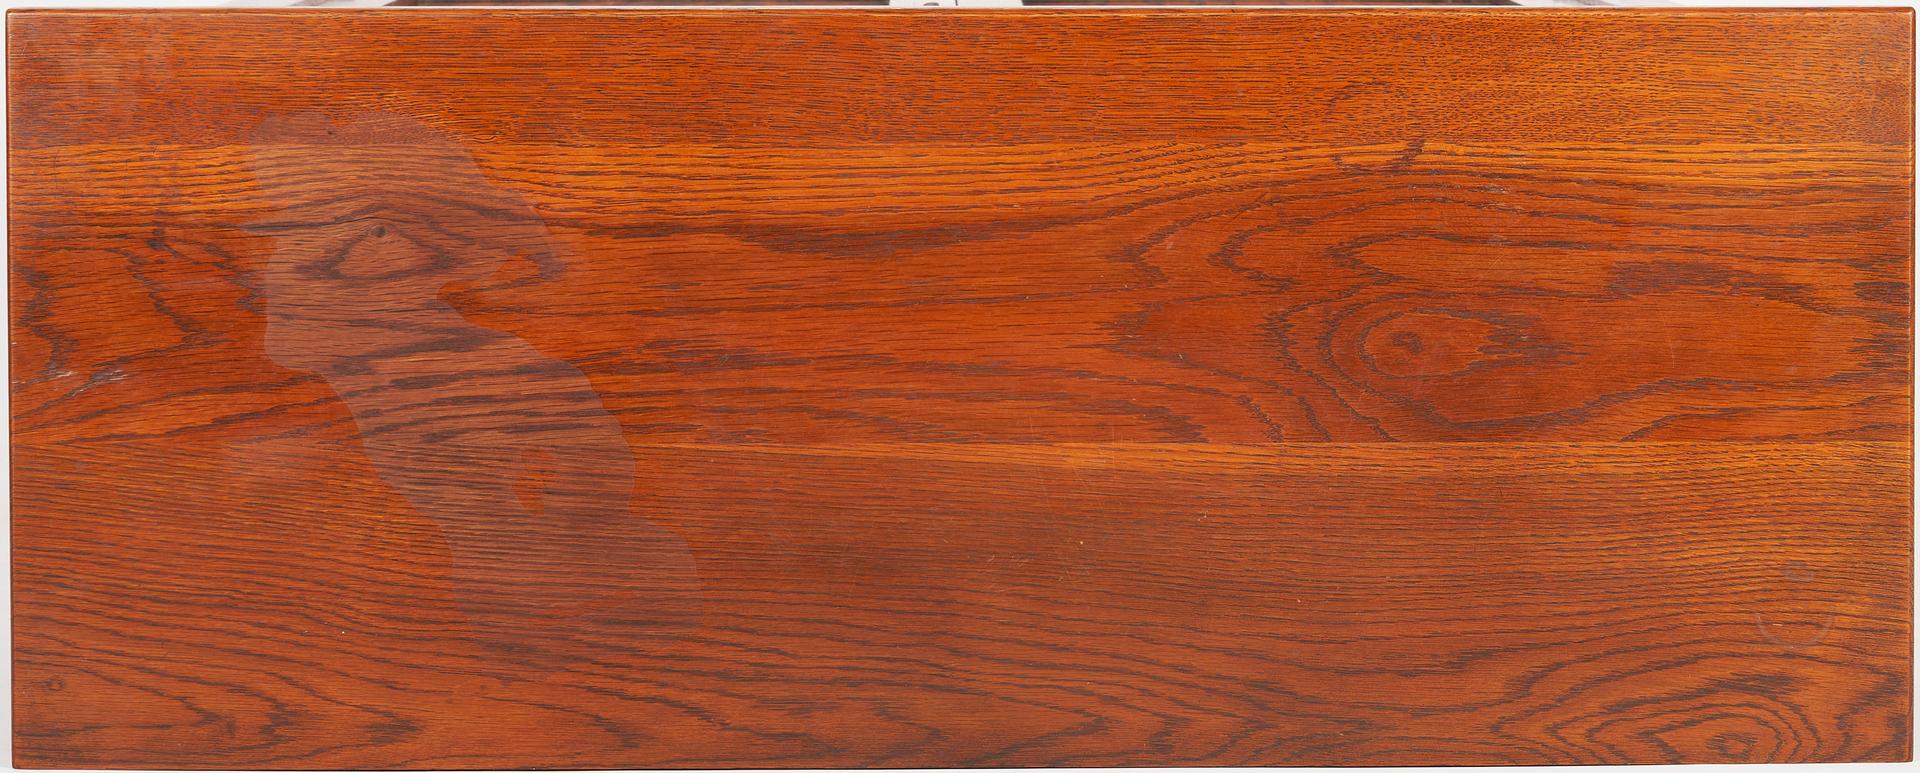 Lot 533: Stickley Brothers Arts & Crafts Oak China Cabinet